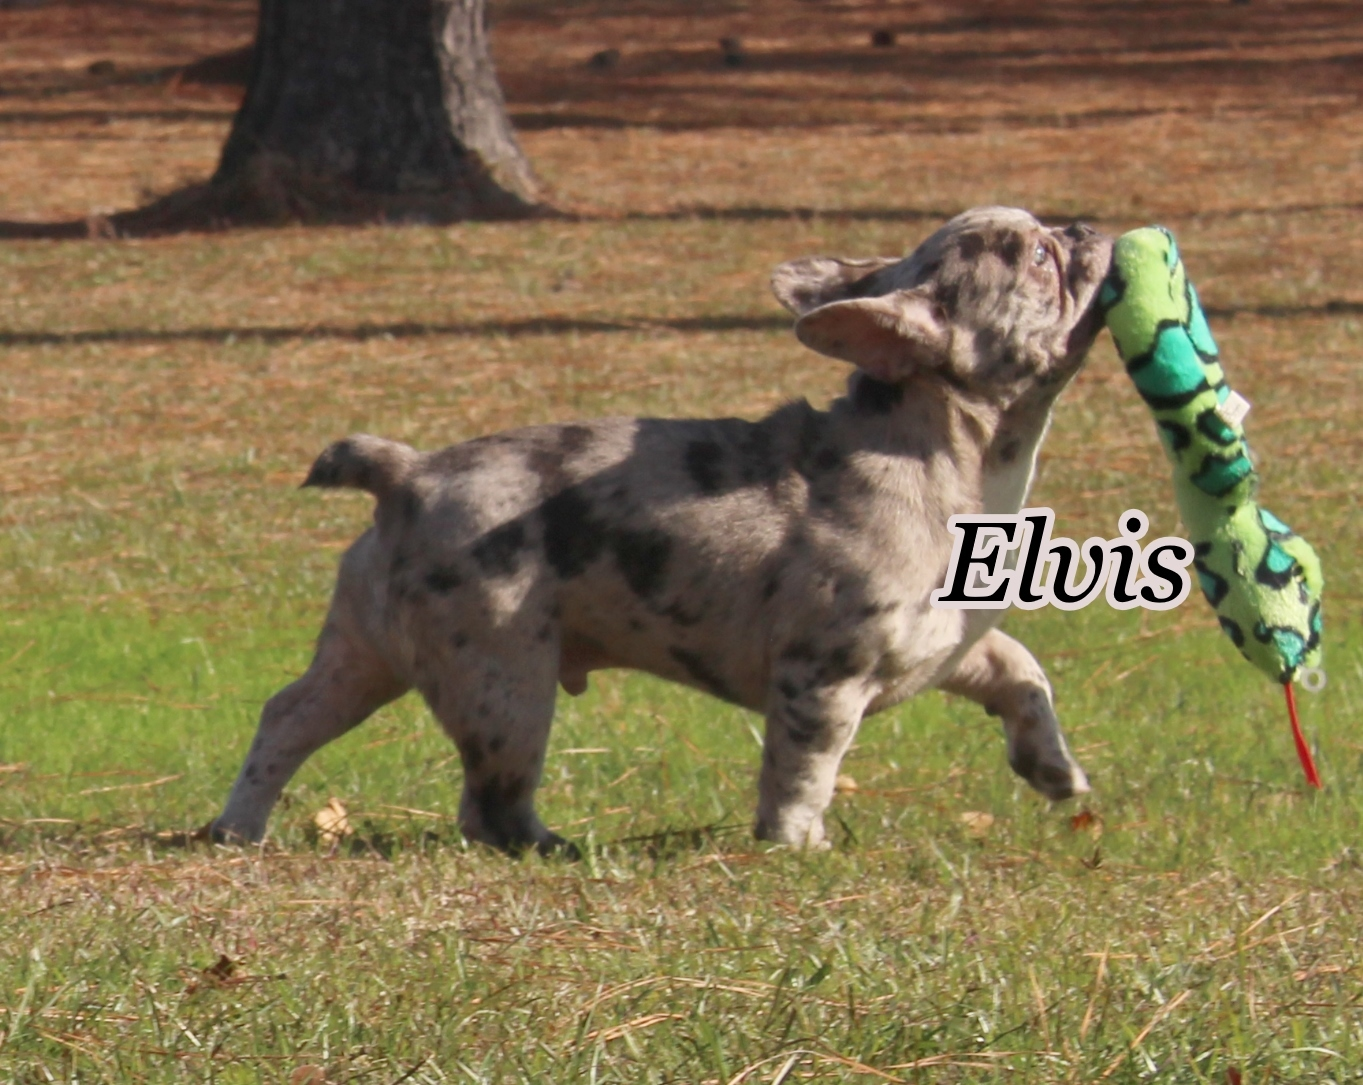 #FrenchBulldogPuppies #MerleFrenchBulldog #Frenchie #AvailablePuppies #AKCRegFrenchBulldog #SouthernTerritoryFrenchies #Elvis